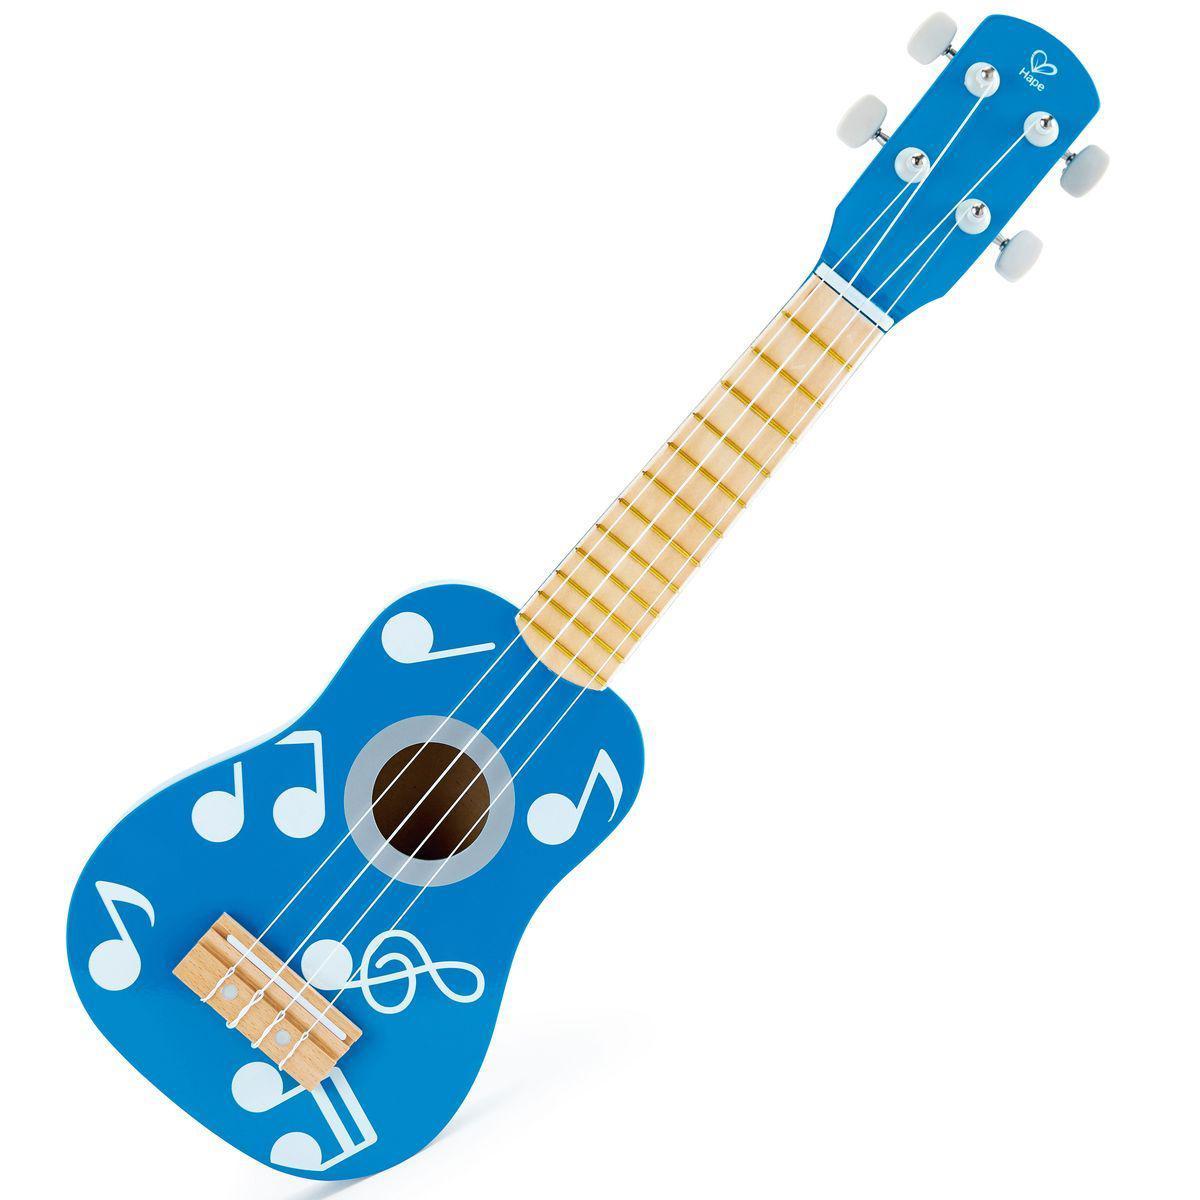 Instrument musique UKULELE Hape blue